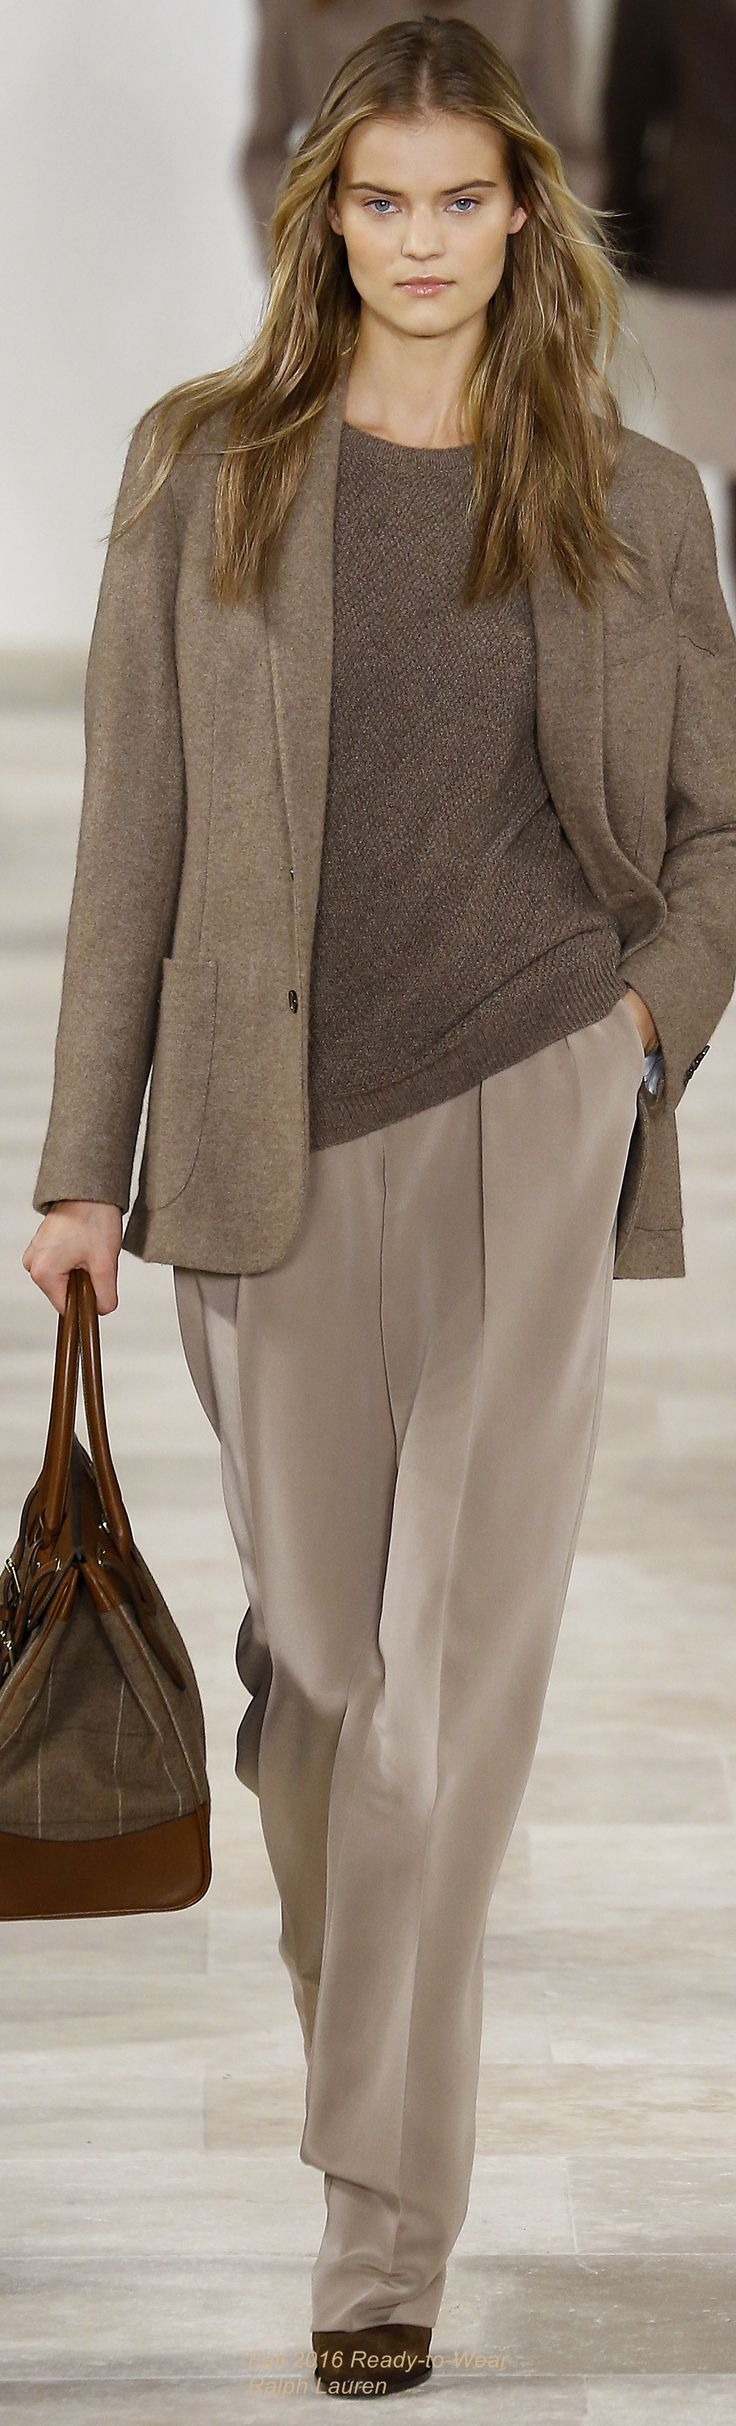 http://www.popularclothingstyles.com/category/ralph-lauren/ Fall 2016 Ready-to-Wear Ralph Lauren